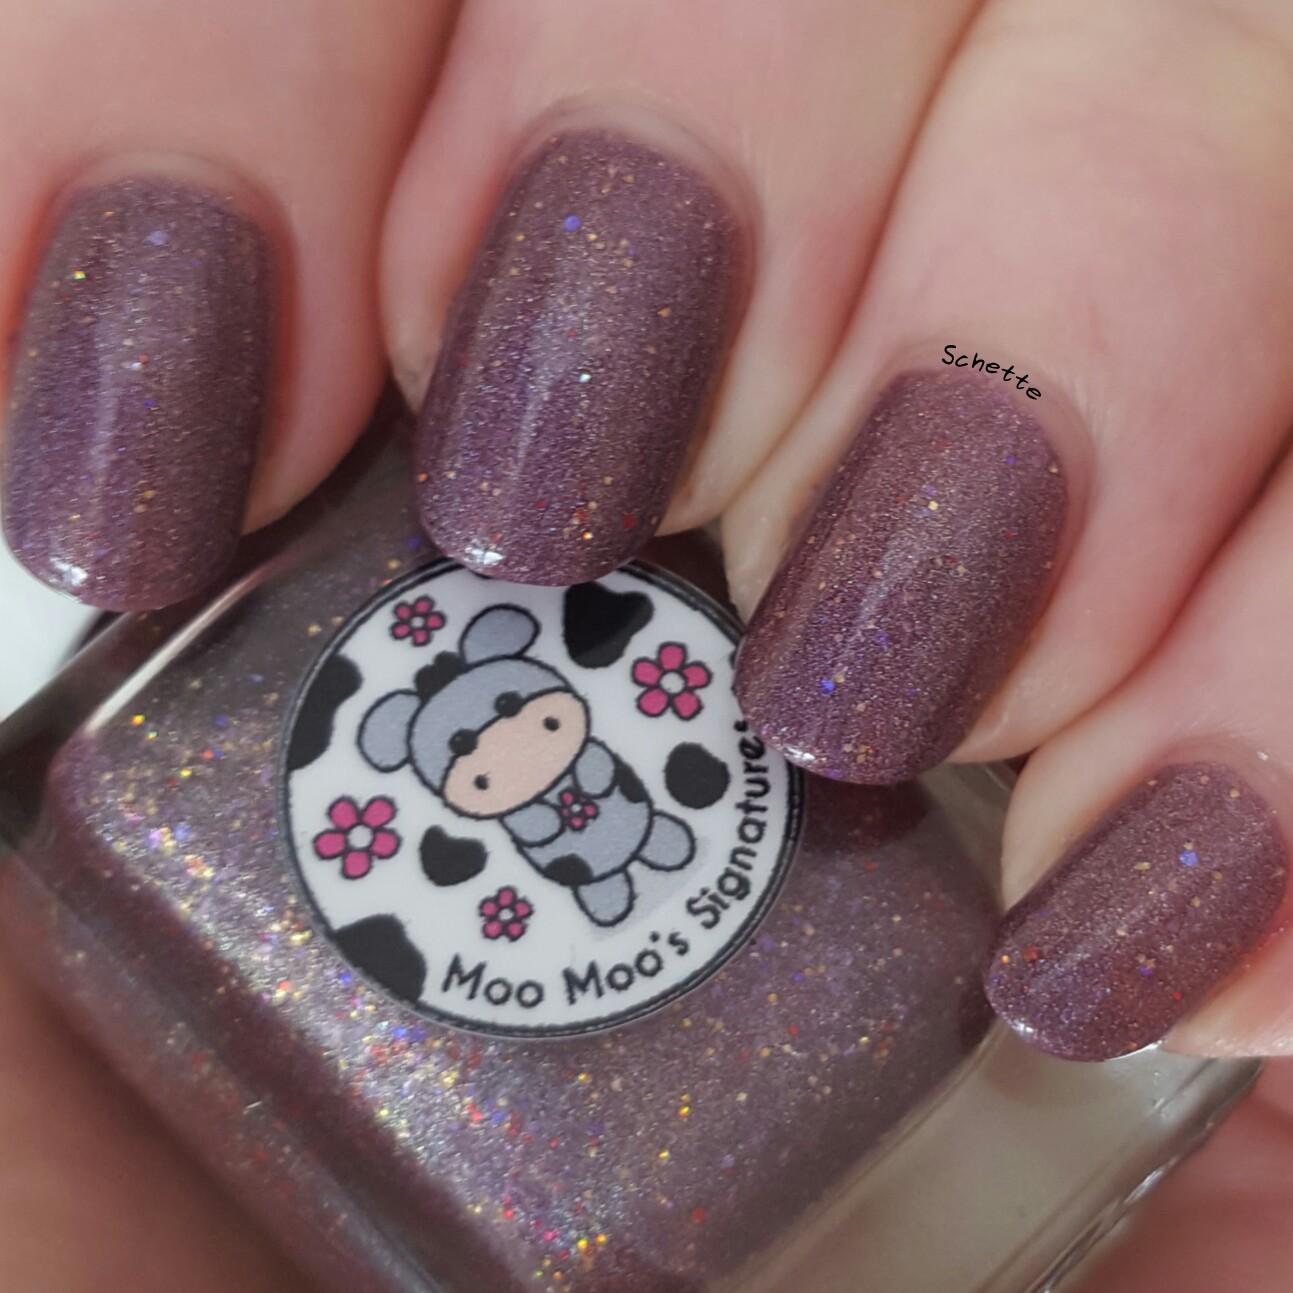 Moo Moo Signature : Sparkly Moo